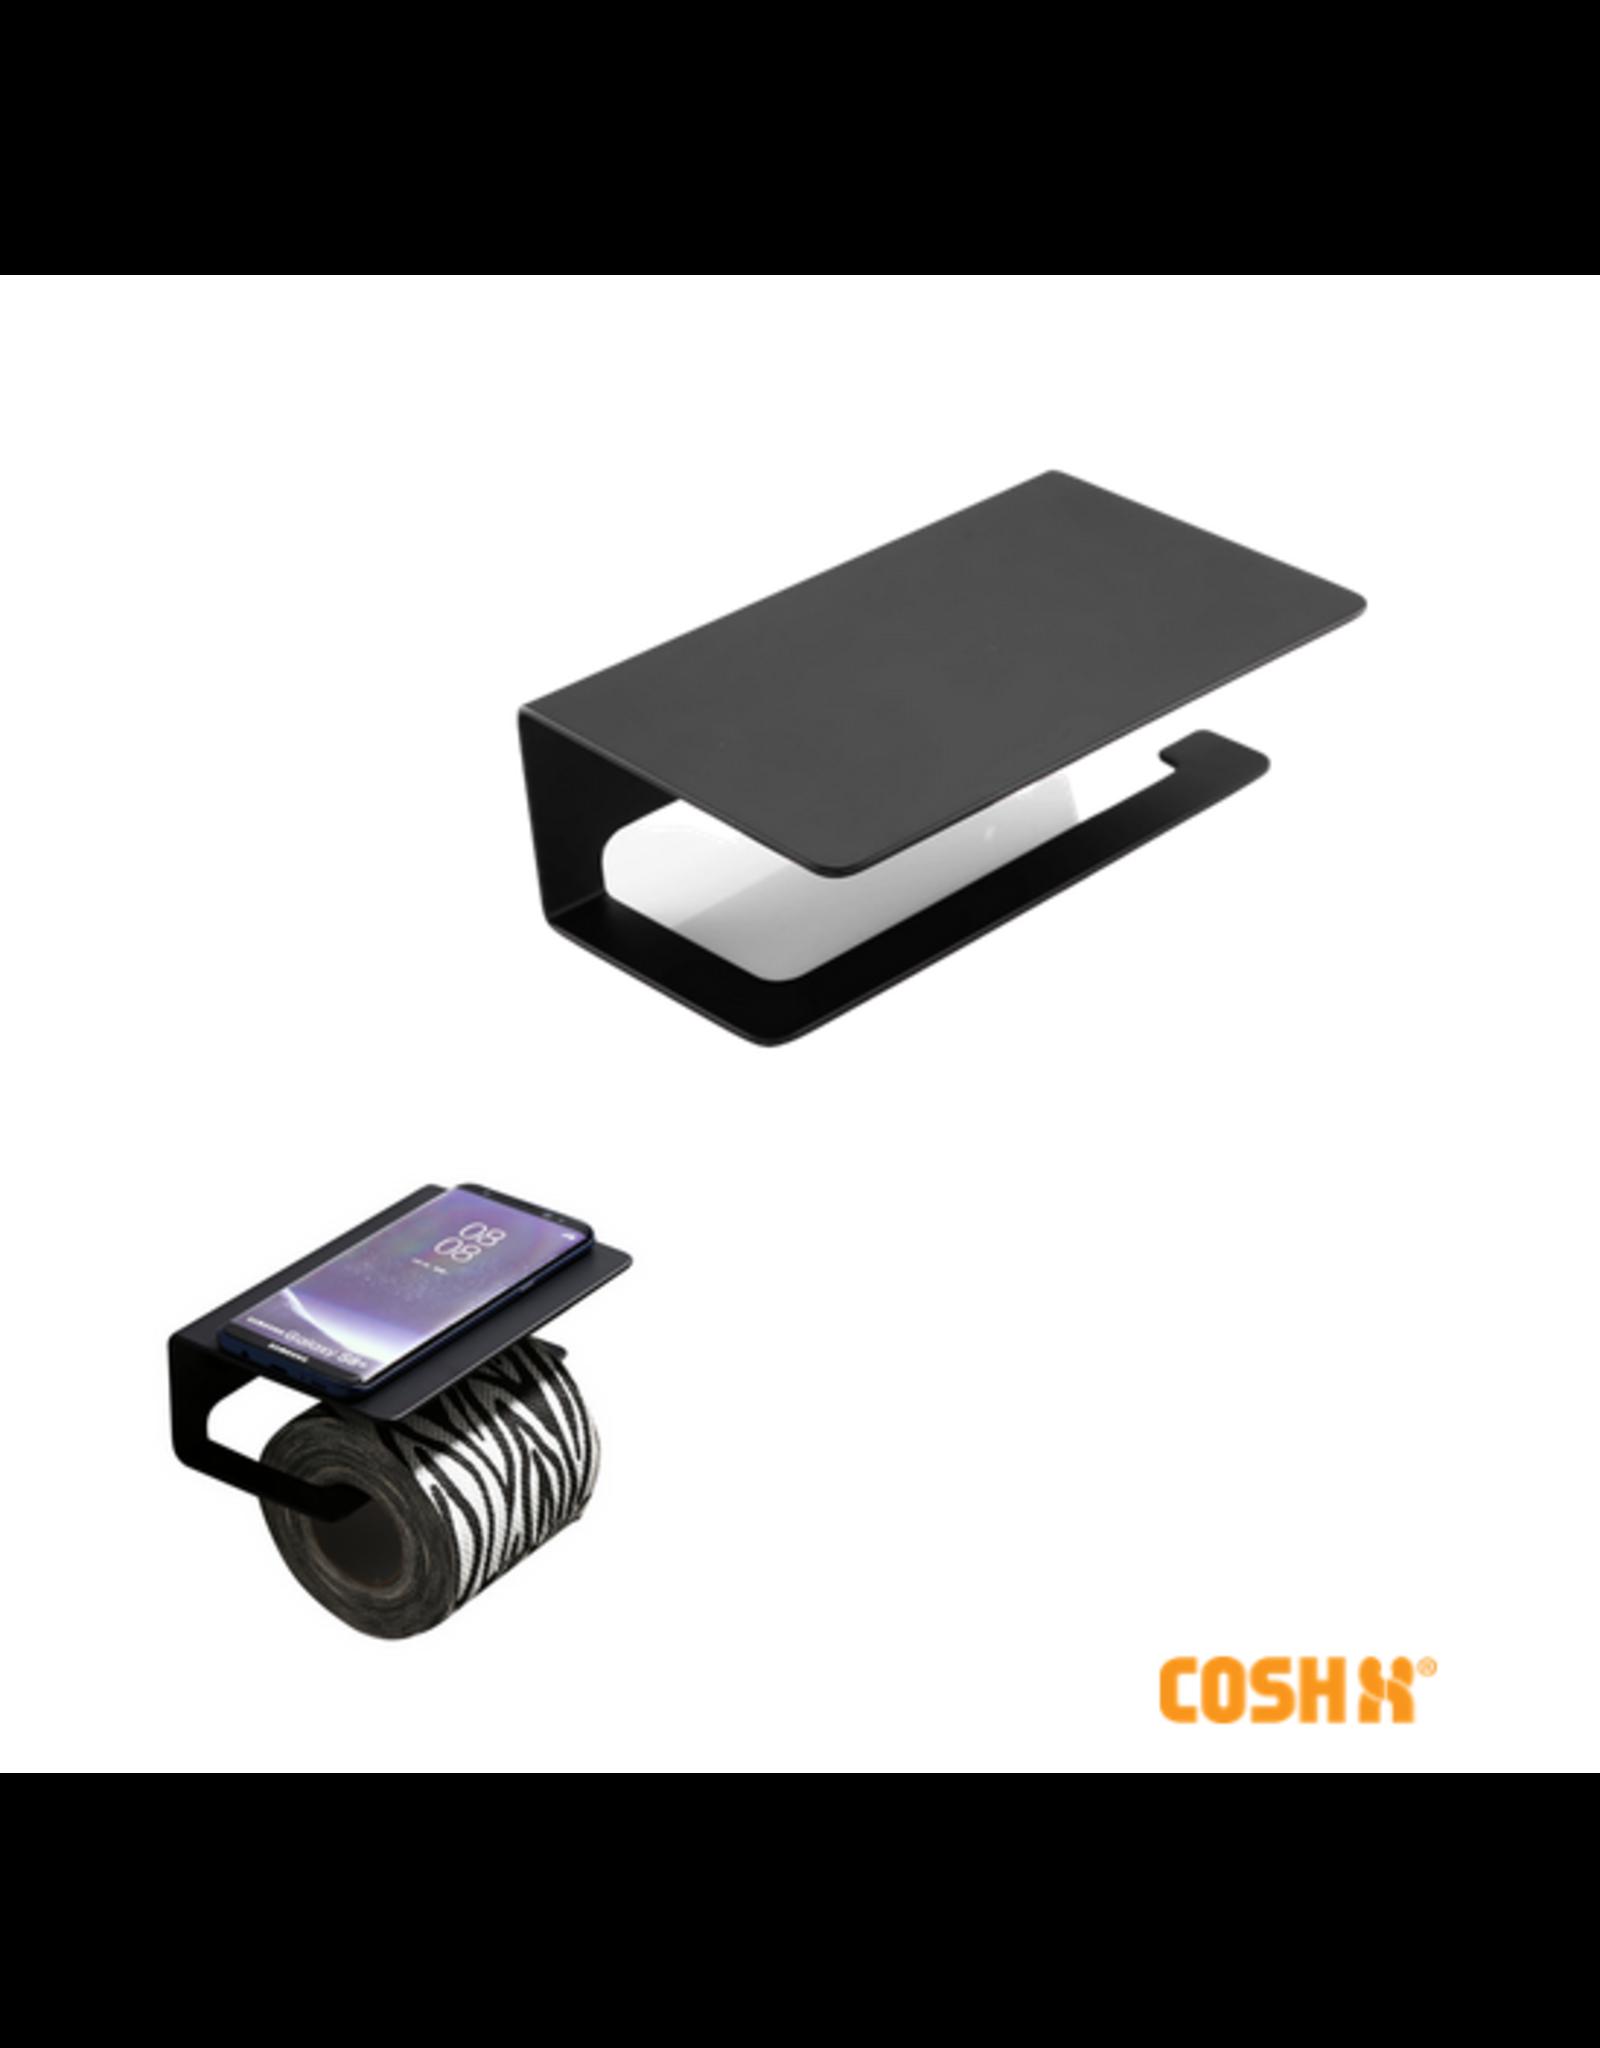 CoshX® CoshX®Toiletrolhouder industrieel met een telefoonplankje zwart - Toiletpapierhouder - WC rol houder